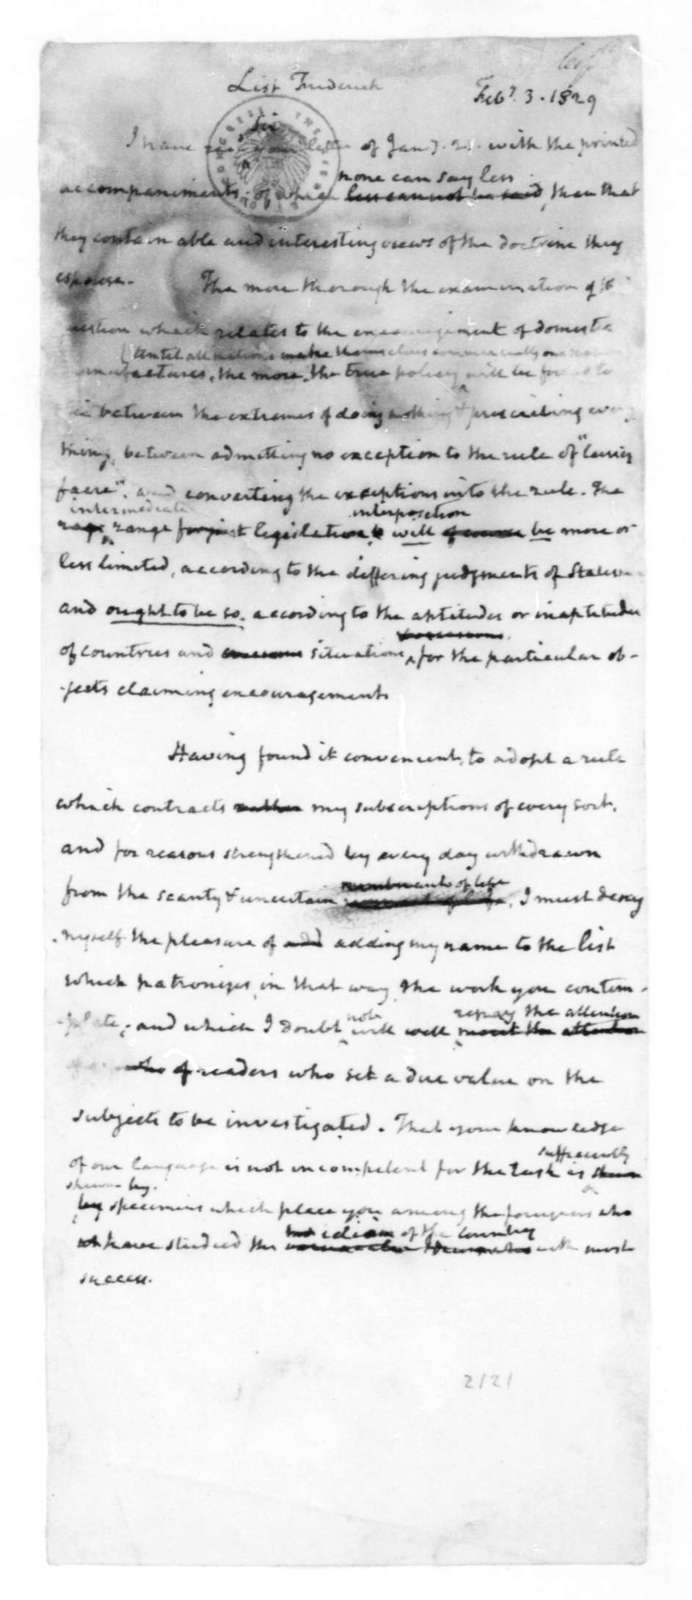 James Madison to Frederick List, February 3, 1829.